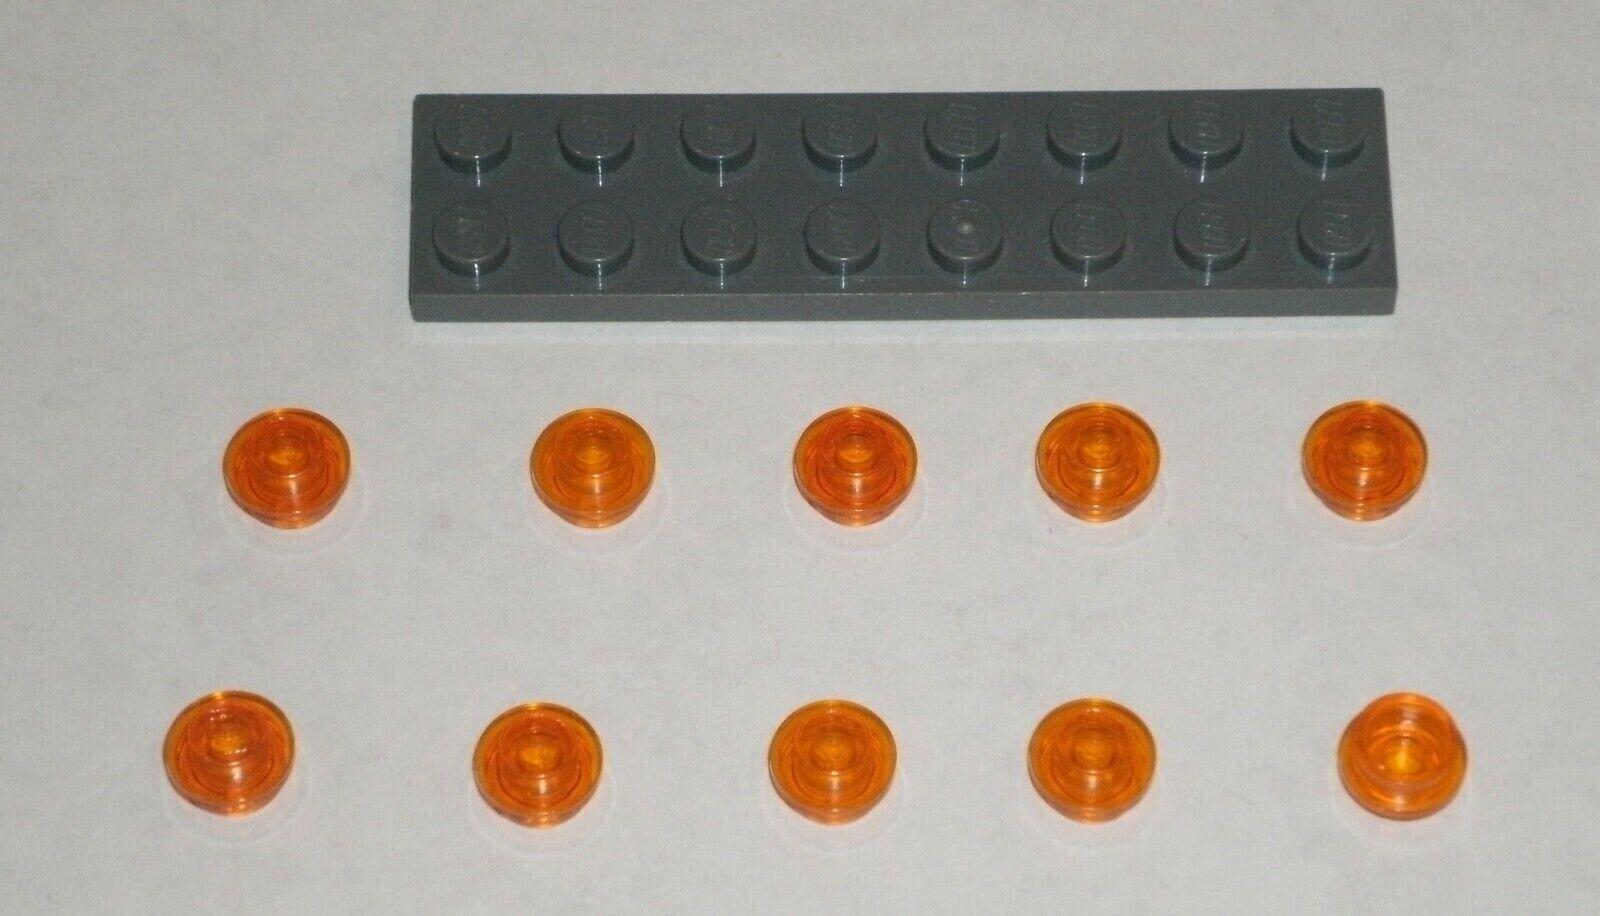 20 Transparent Red 1x1 Round Plates ** NEW ** LDraw part 4073 Bulk Lego Pieces